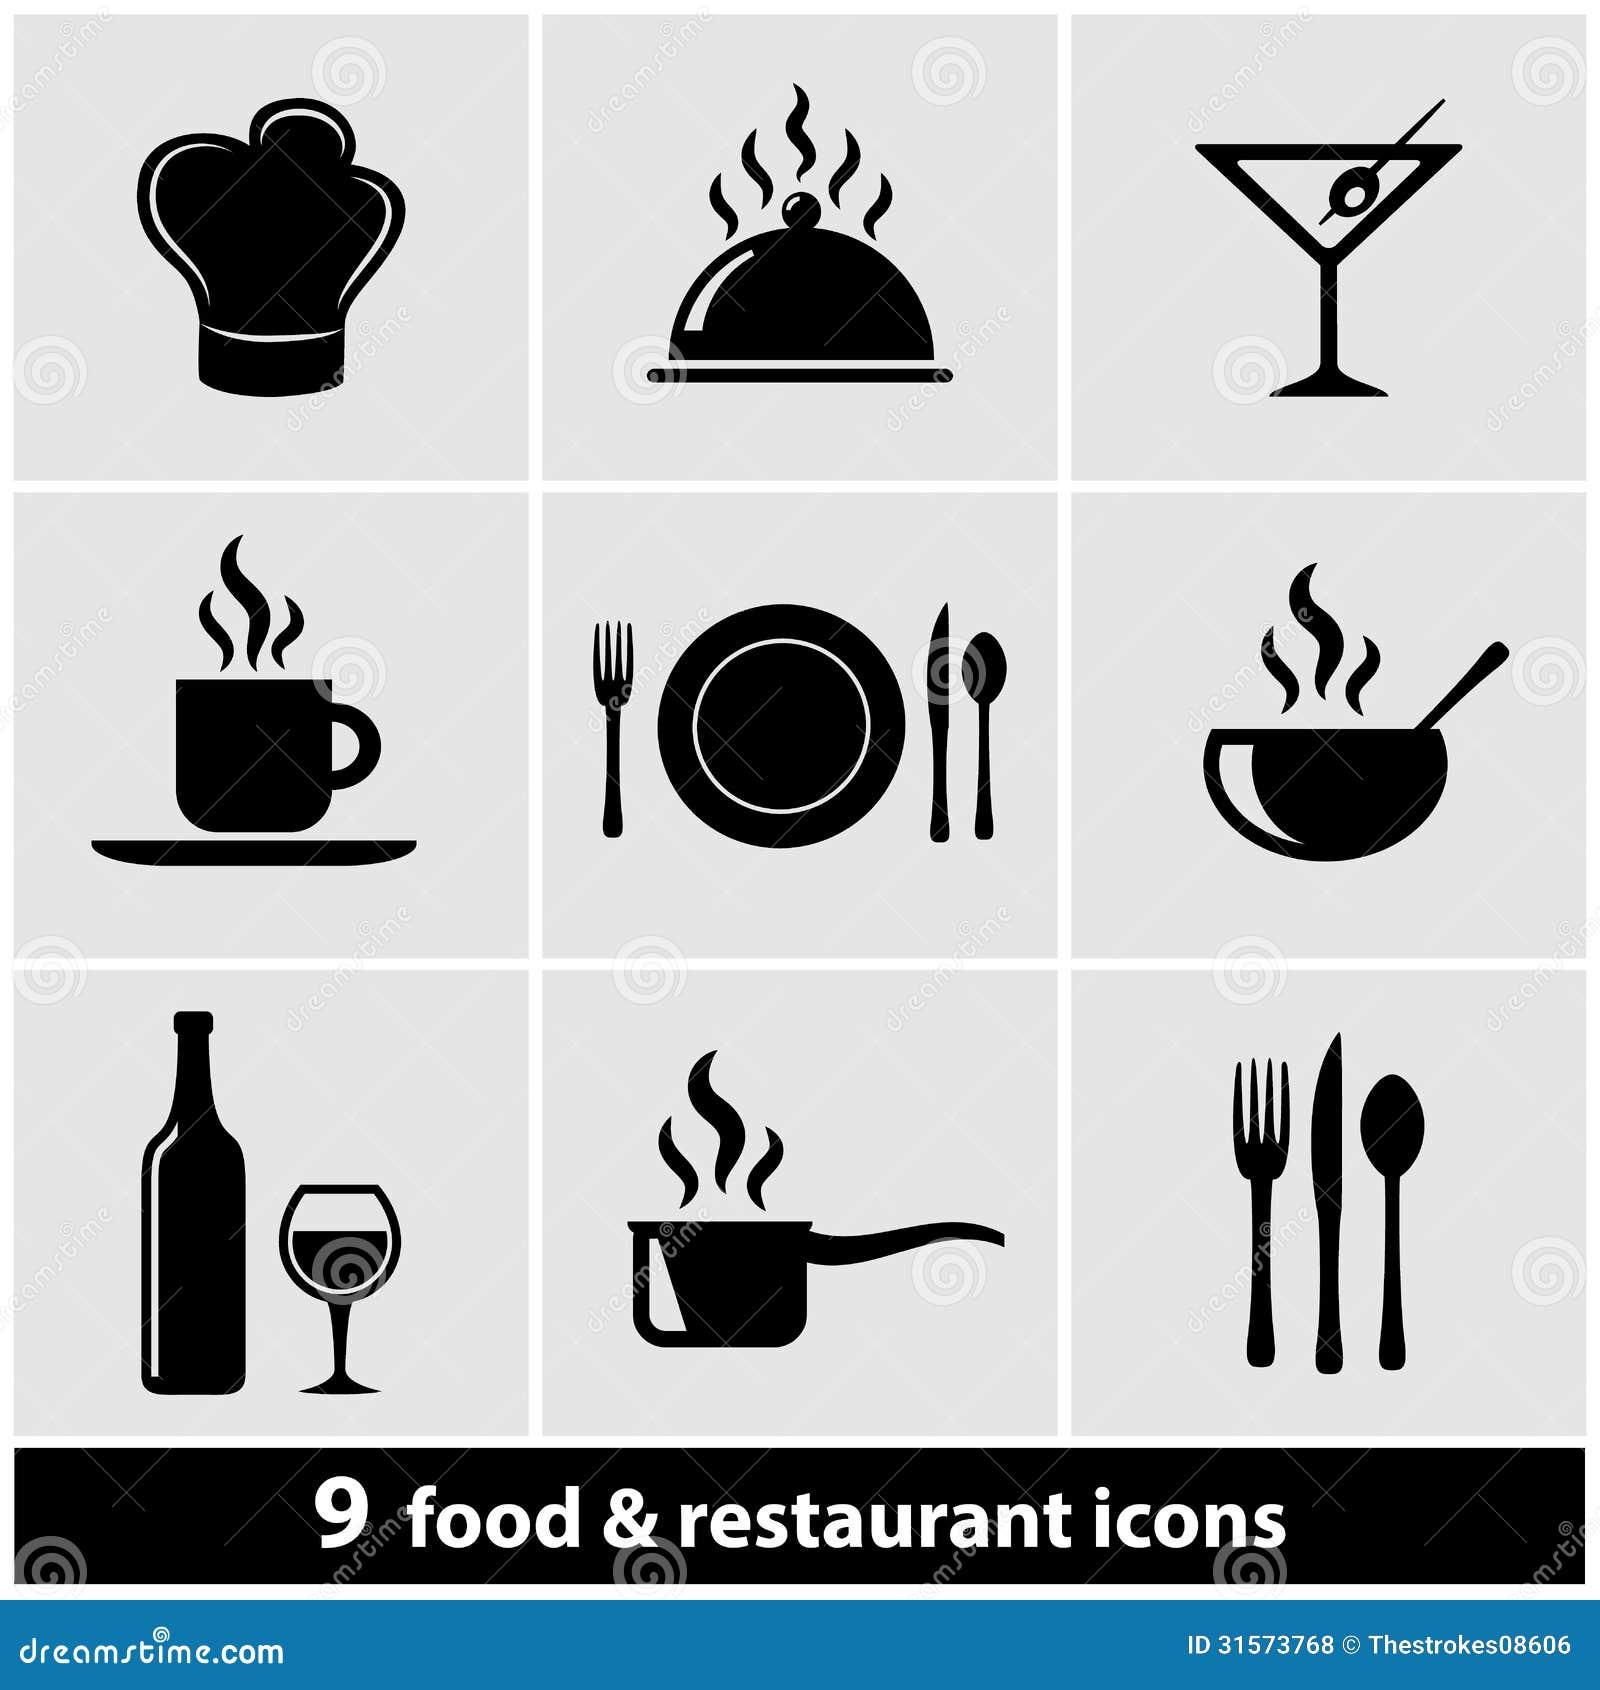 restaurant clipart download - photo #22